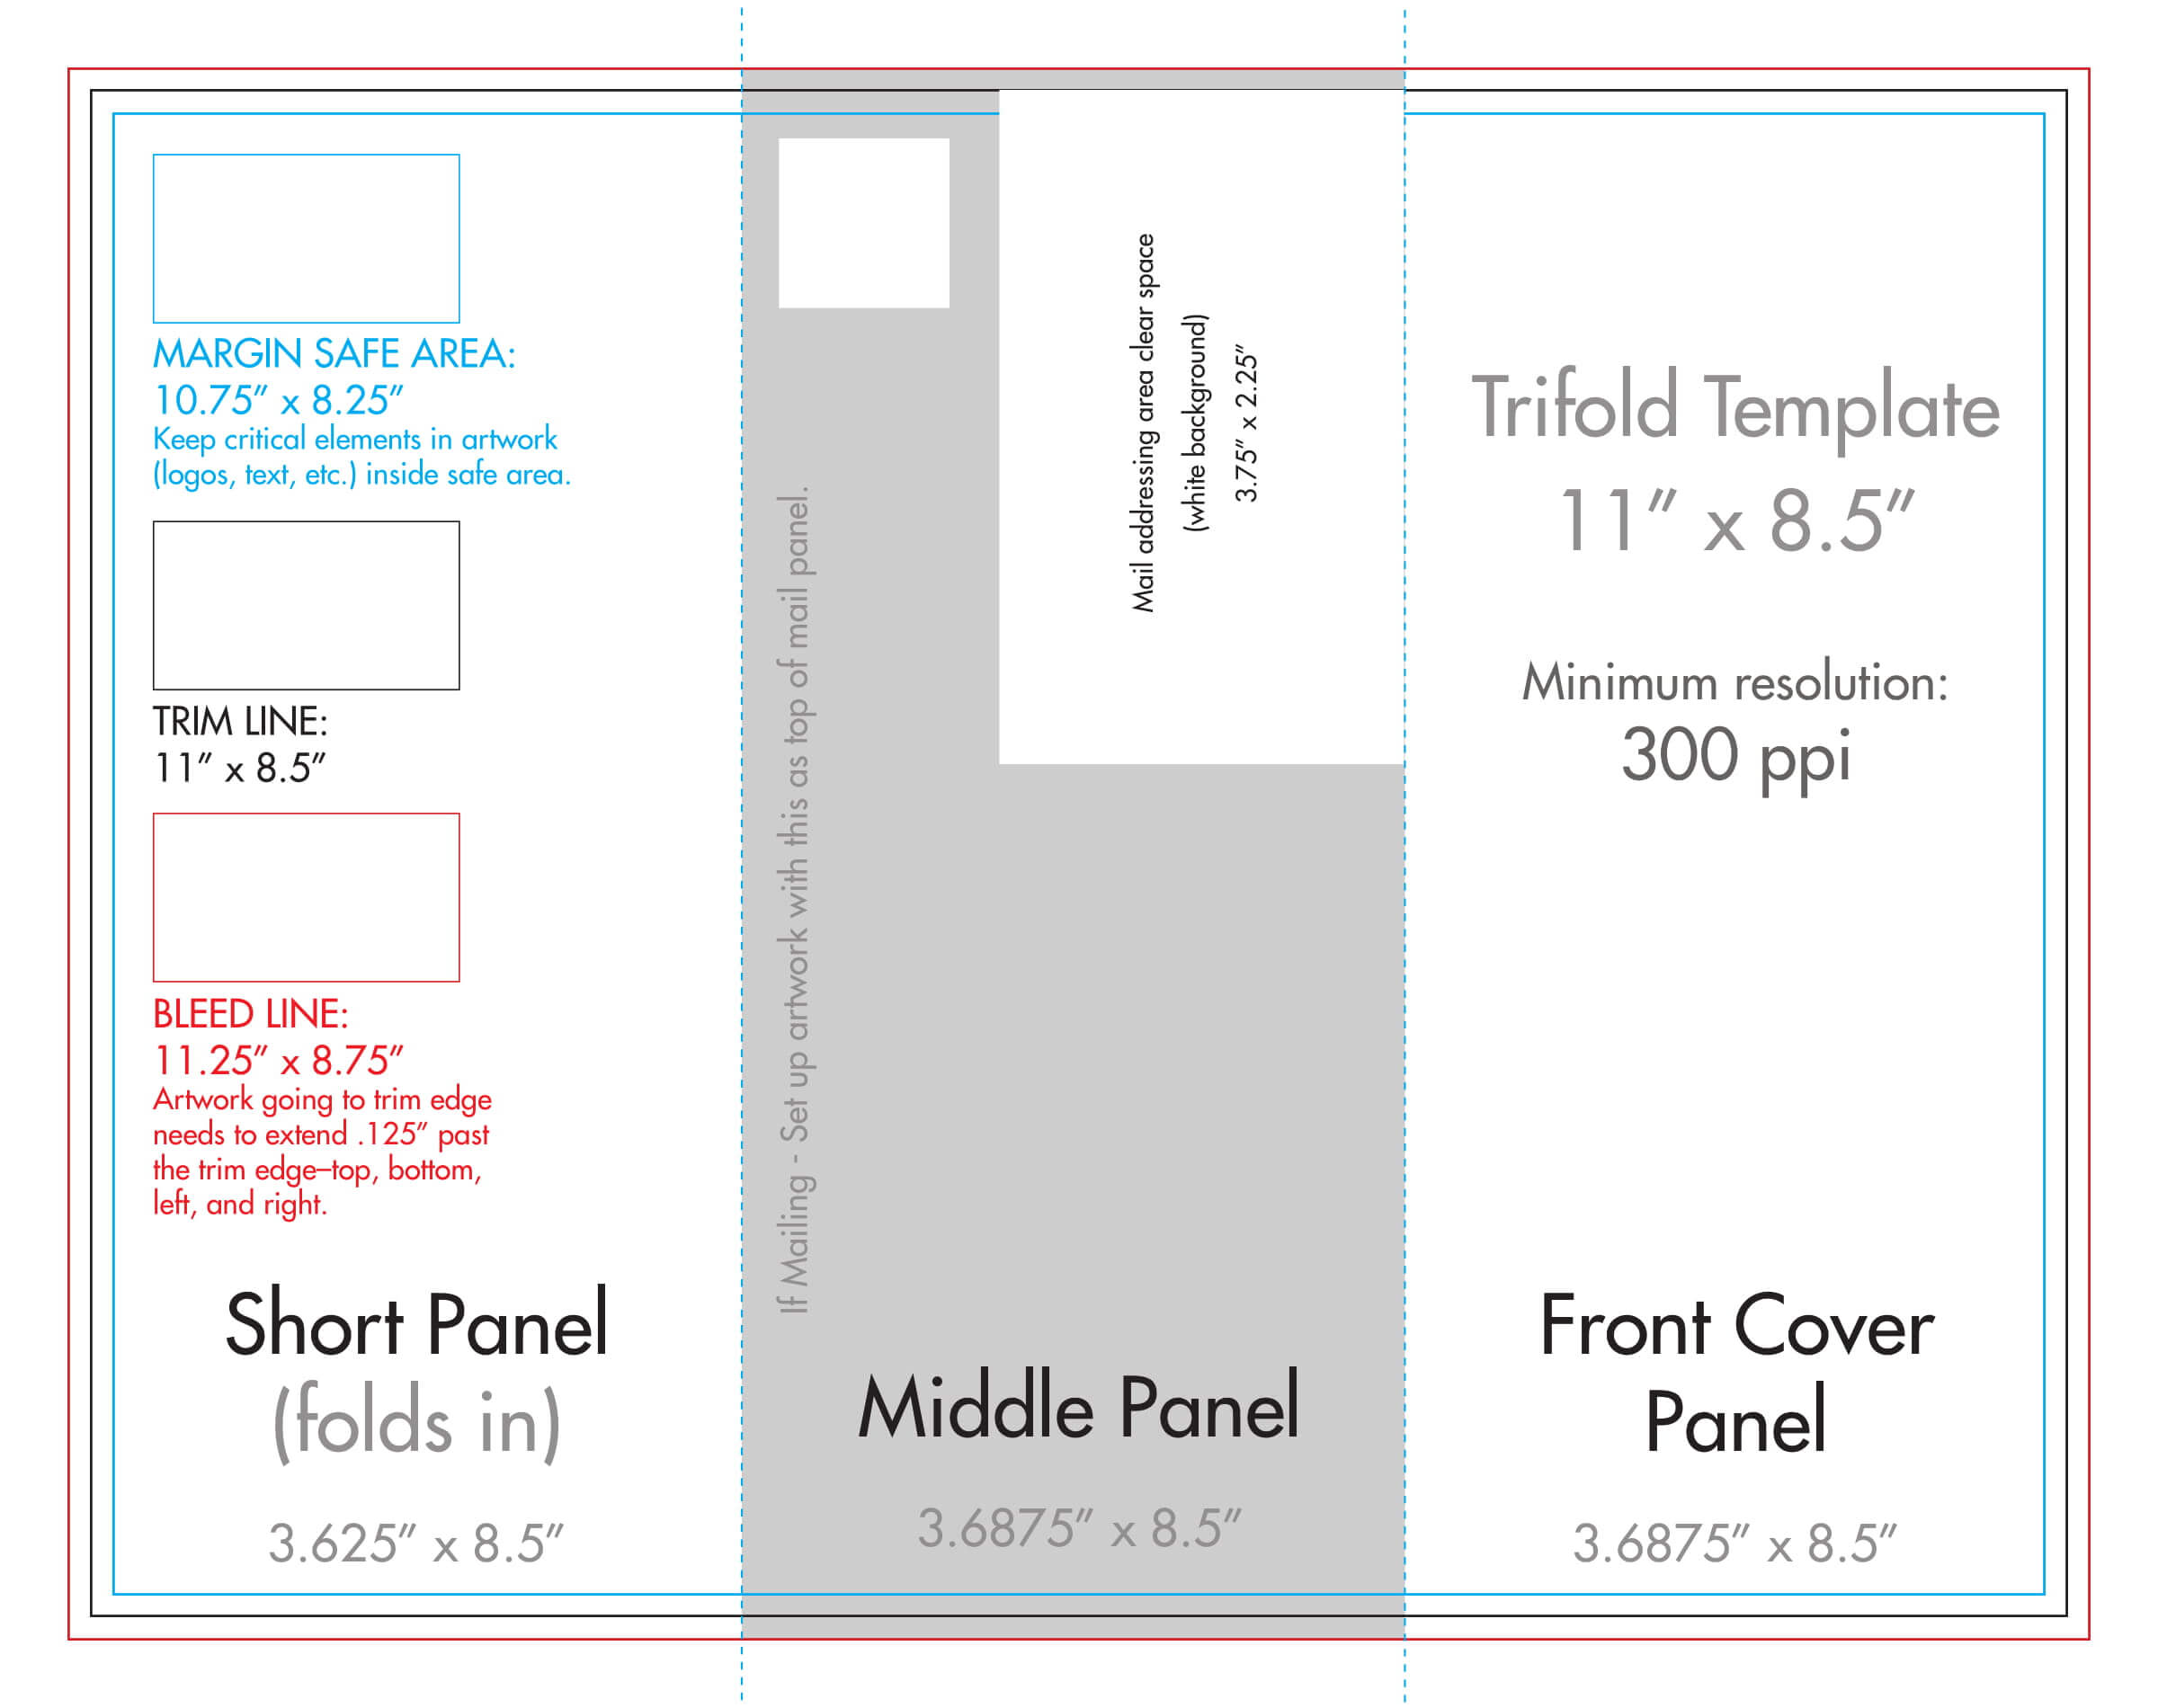 "8.5"" X 11"" Tri Fold Brochure Template - U.s. Press in Brochure Folding Templates"